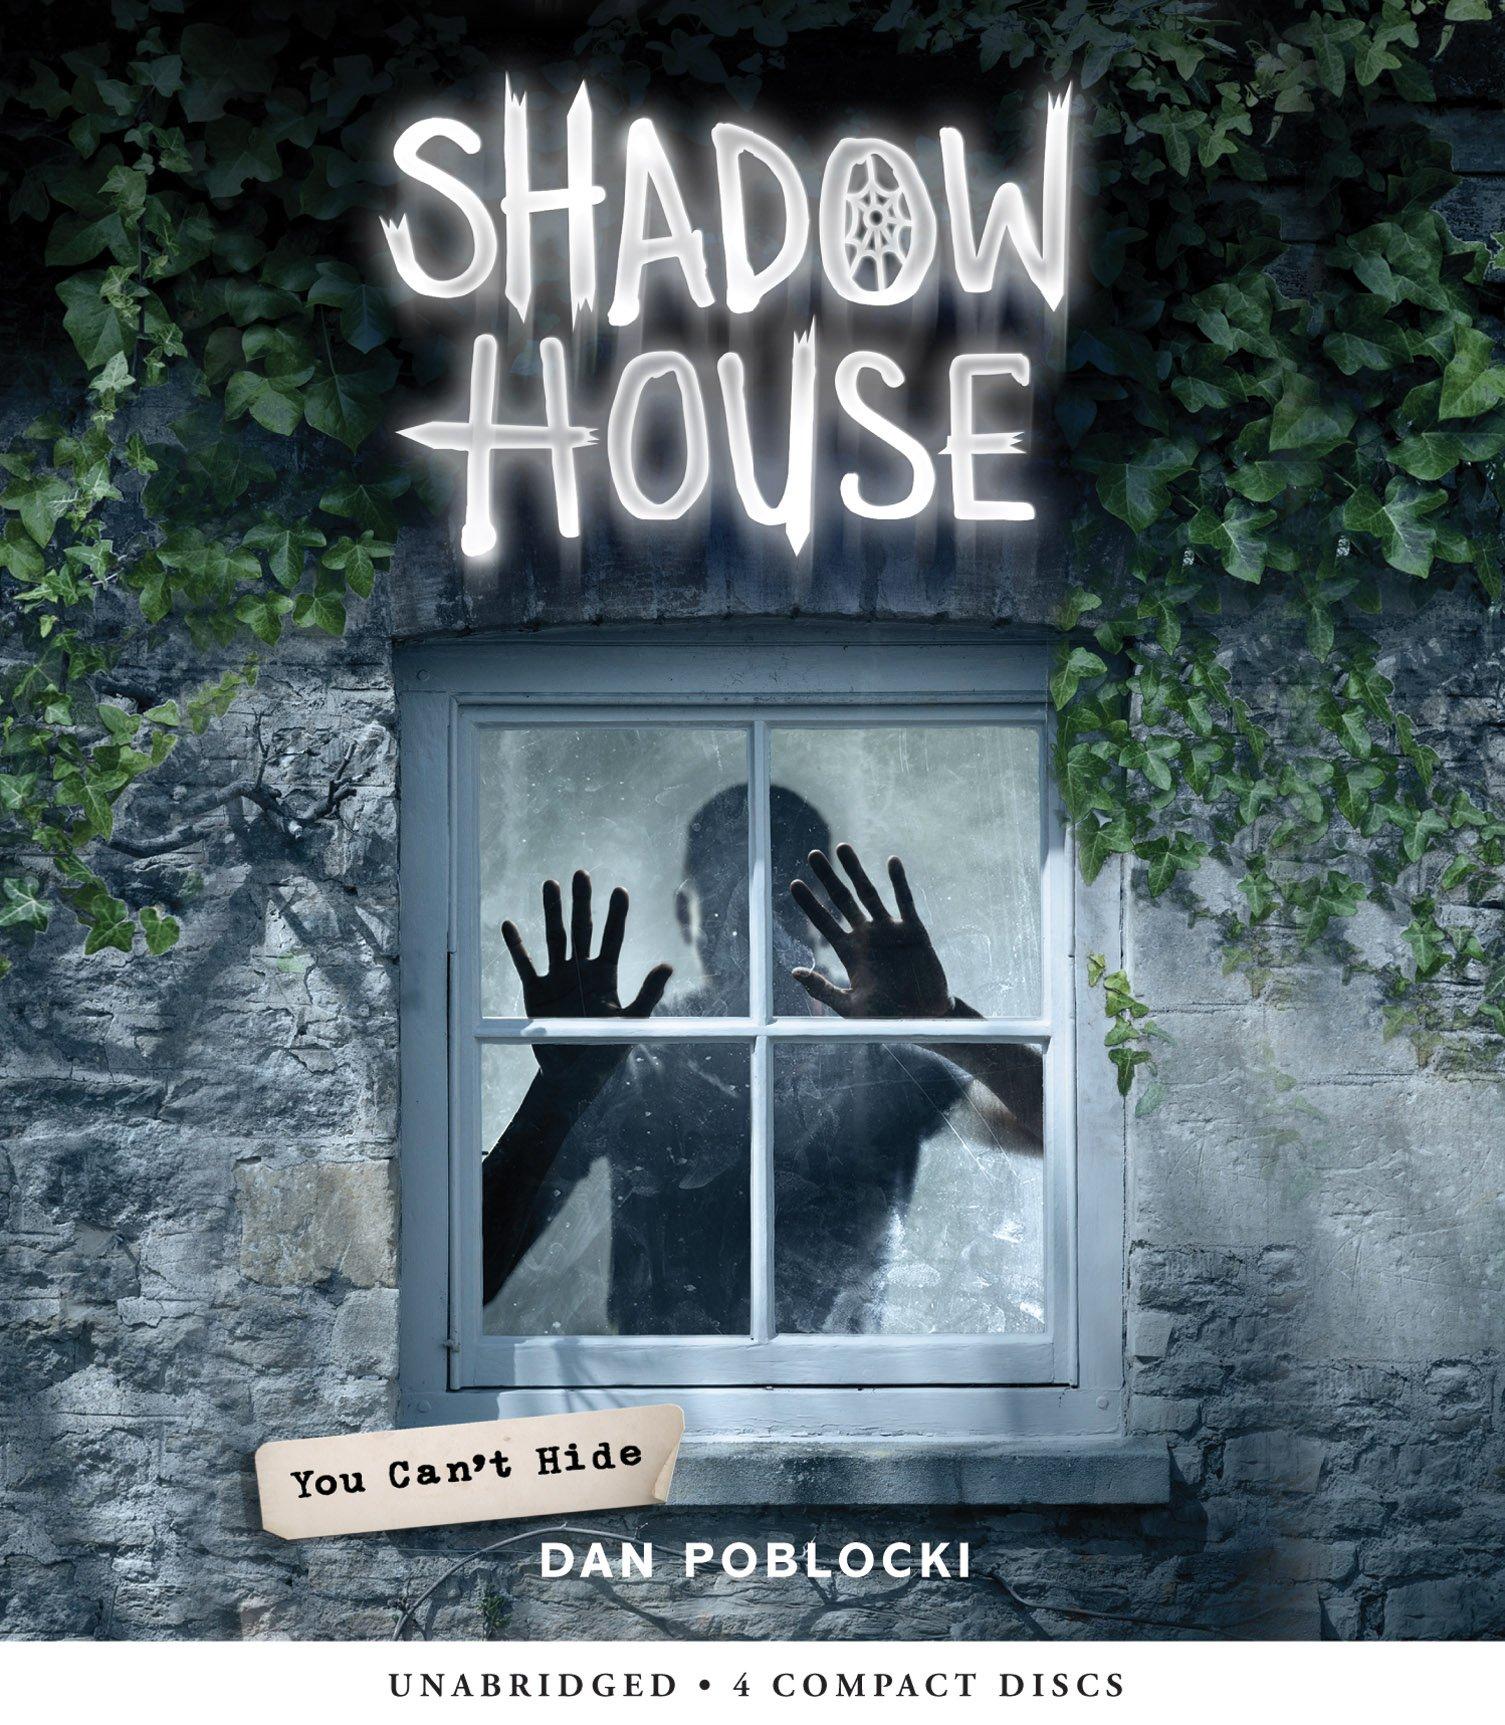 you can t hide shadow house book 2 dan poblocki dan bittner